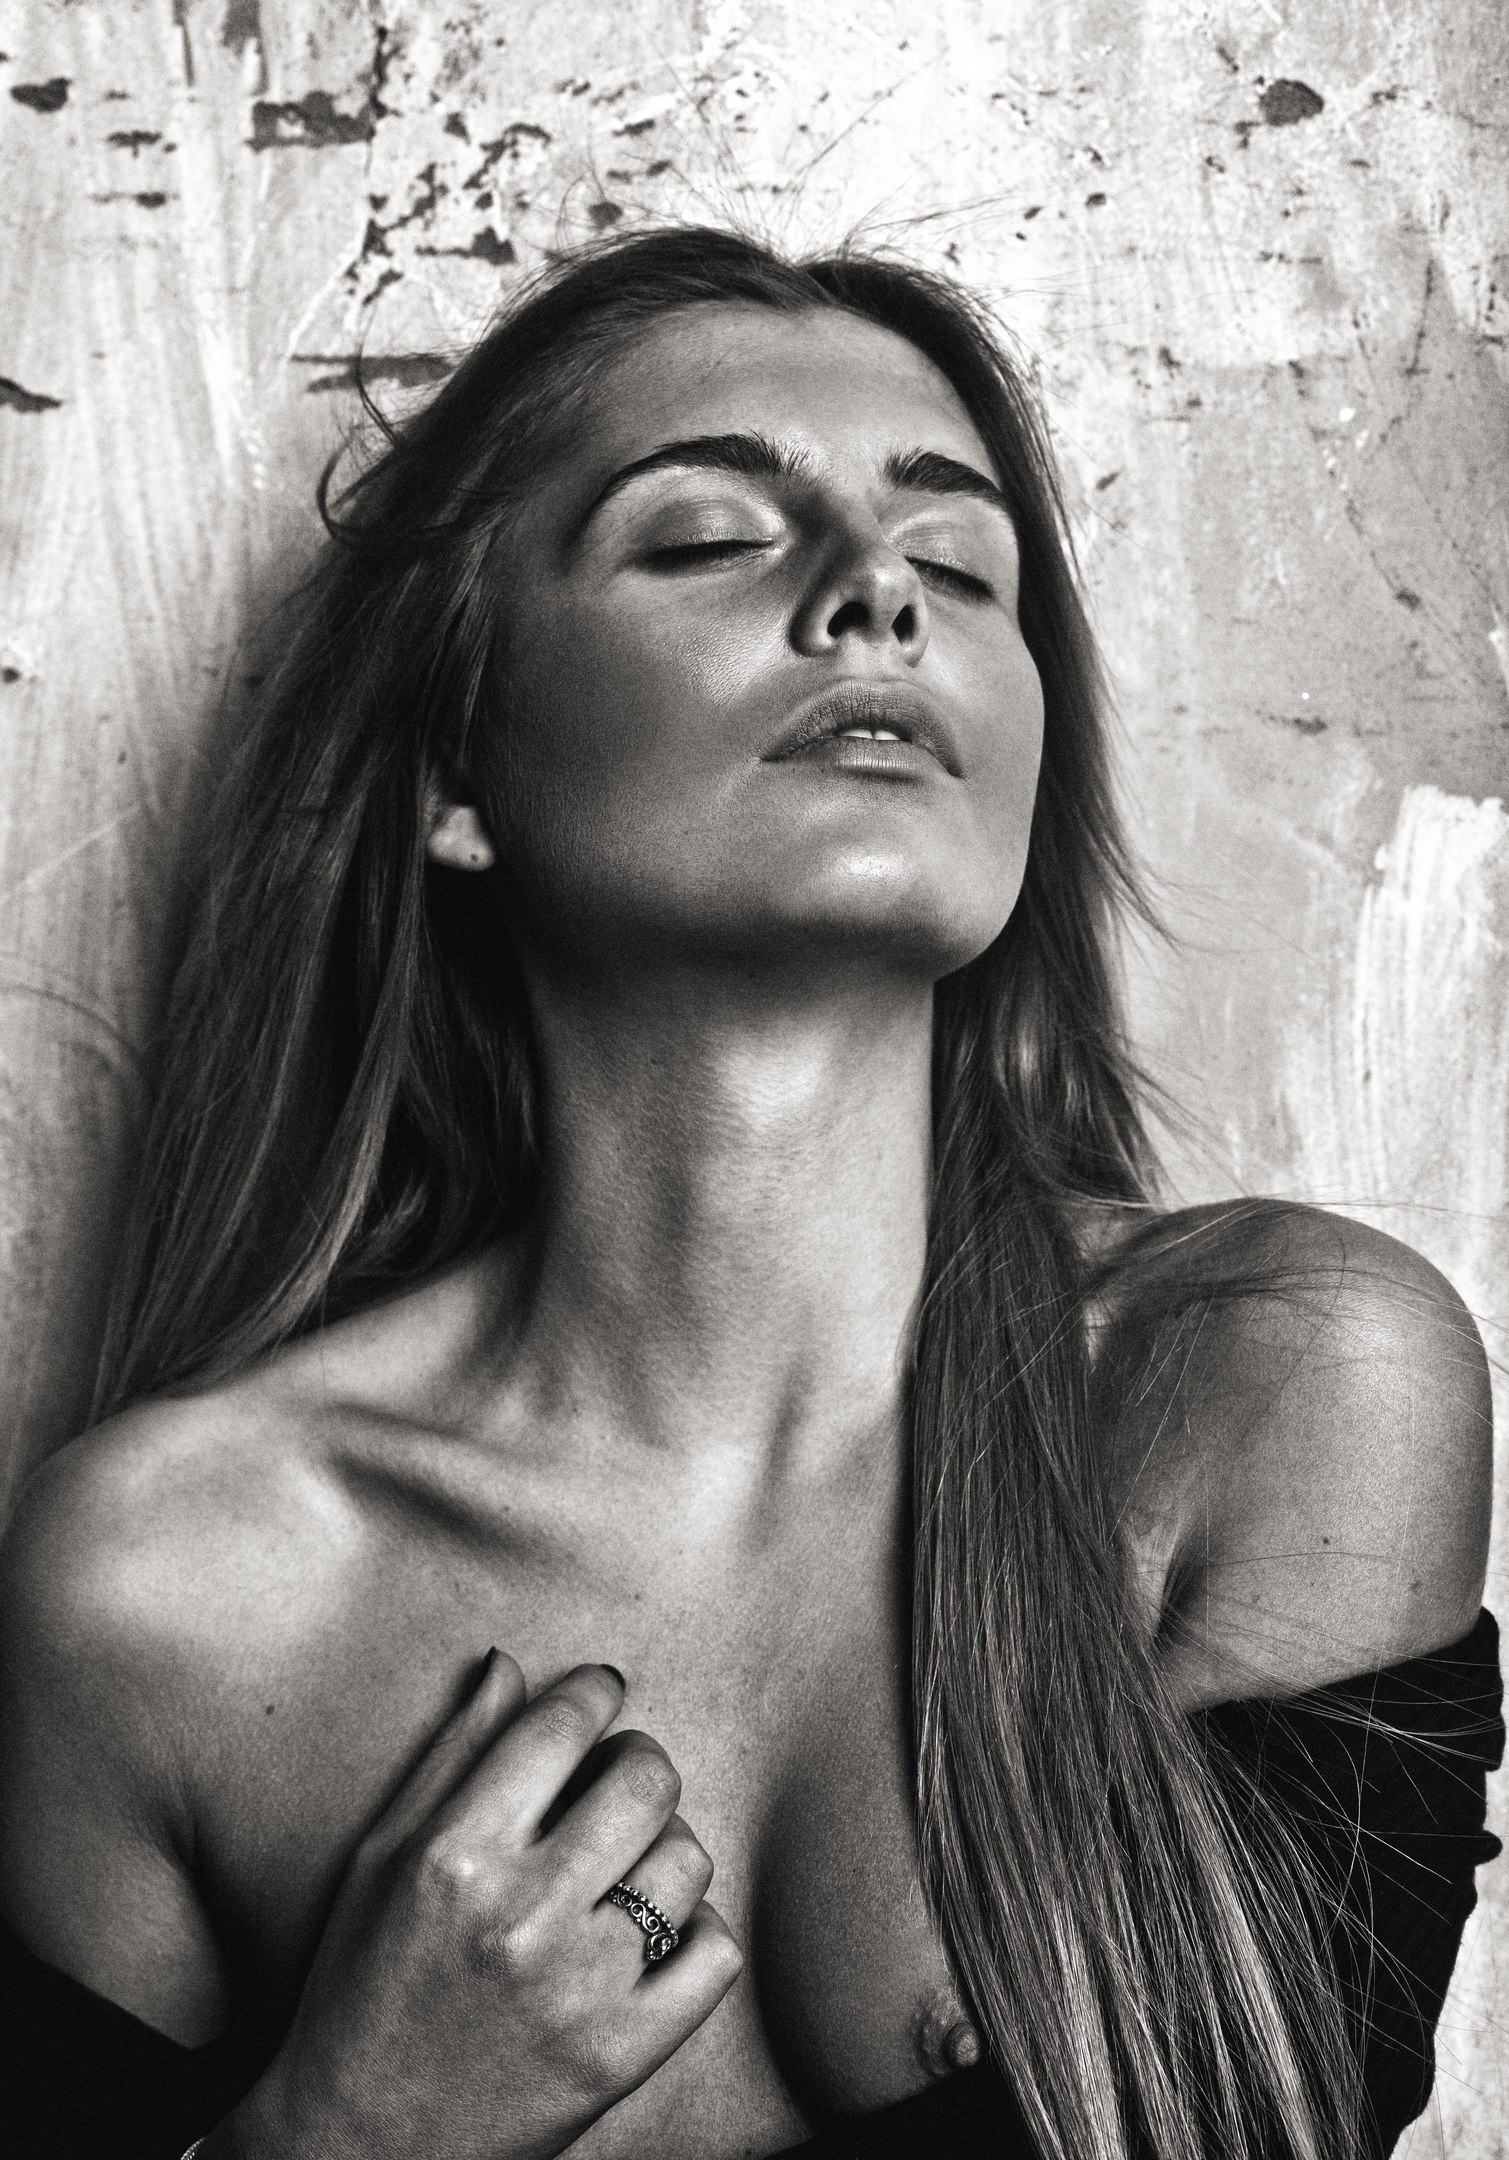 Alina Nefedova by Sergey Kuznetsov